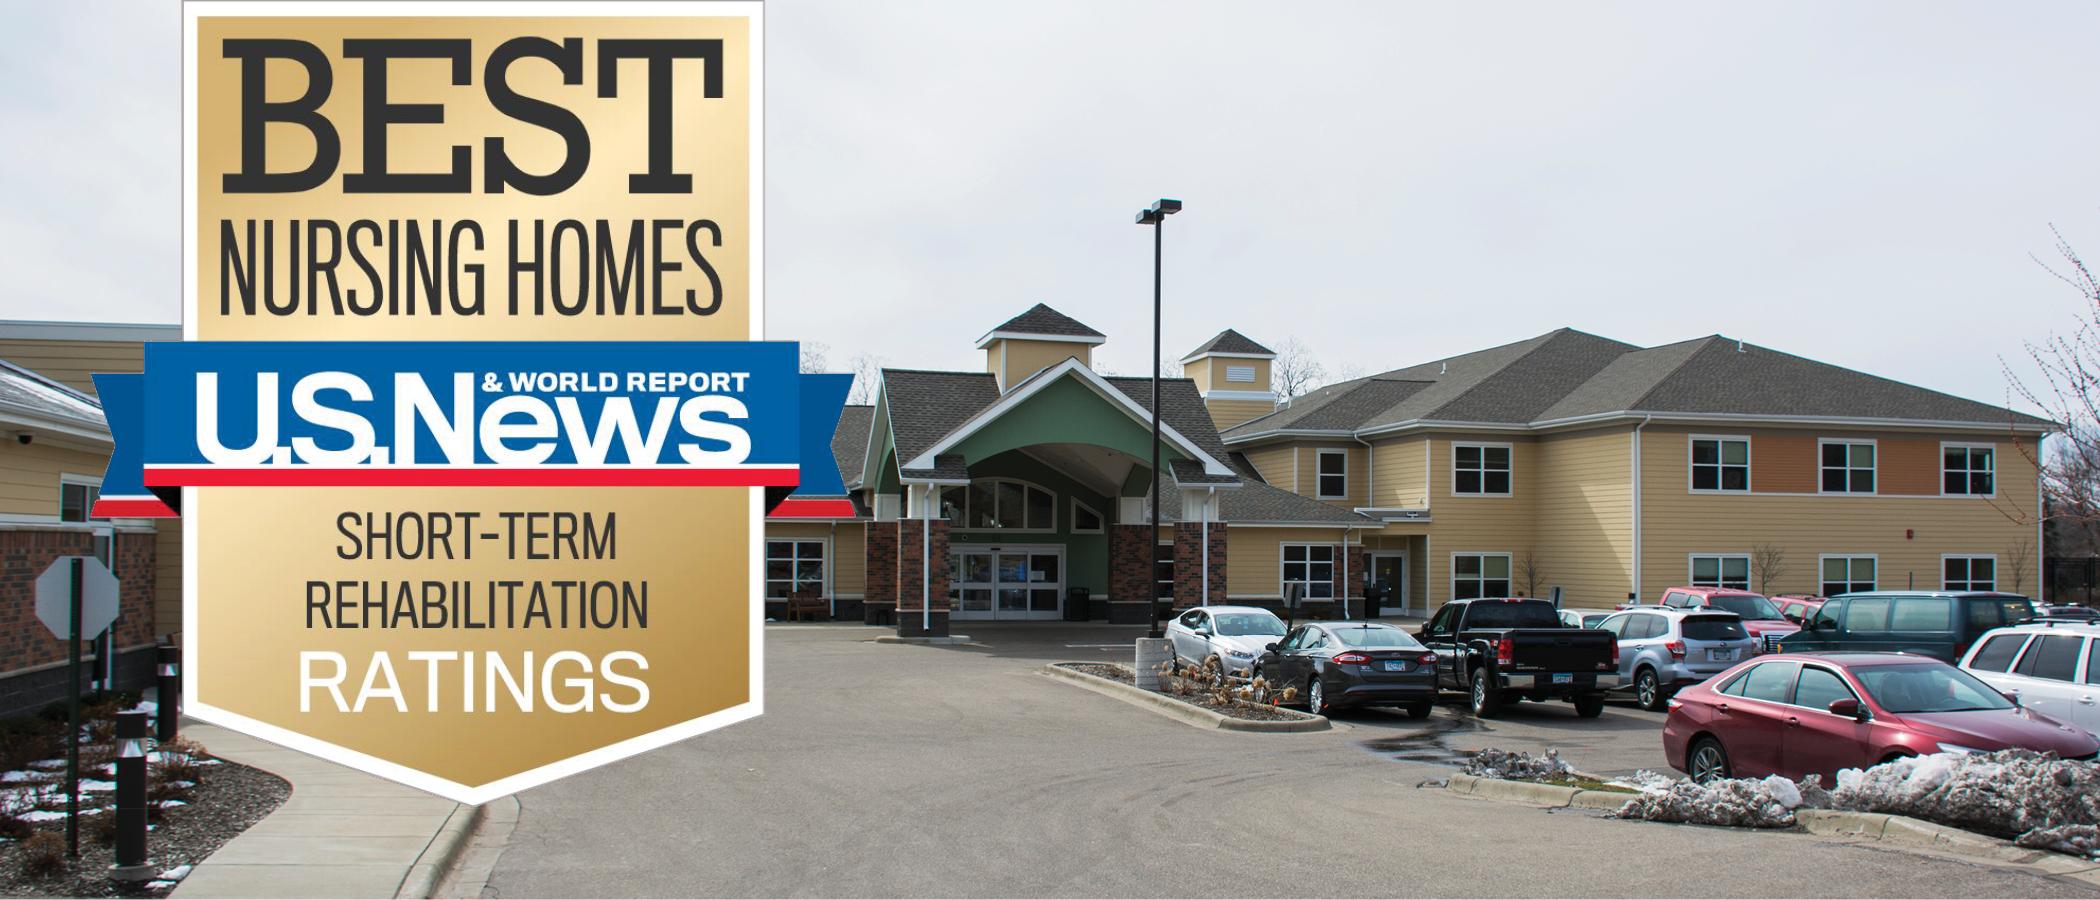 Westwood Ridge II receives Best Nursing Home award from U.S. News